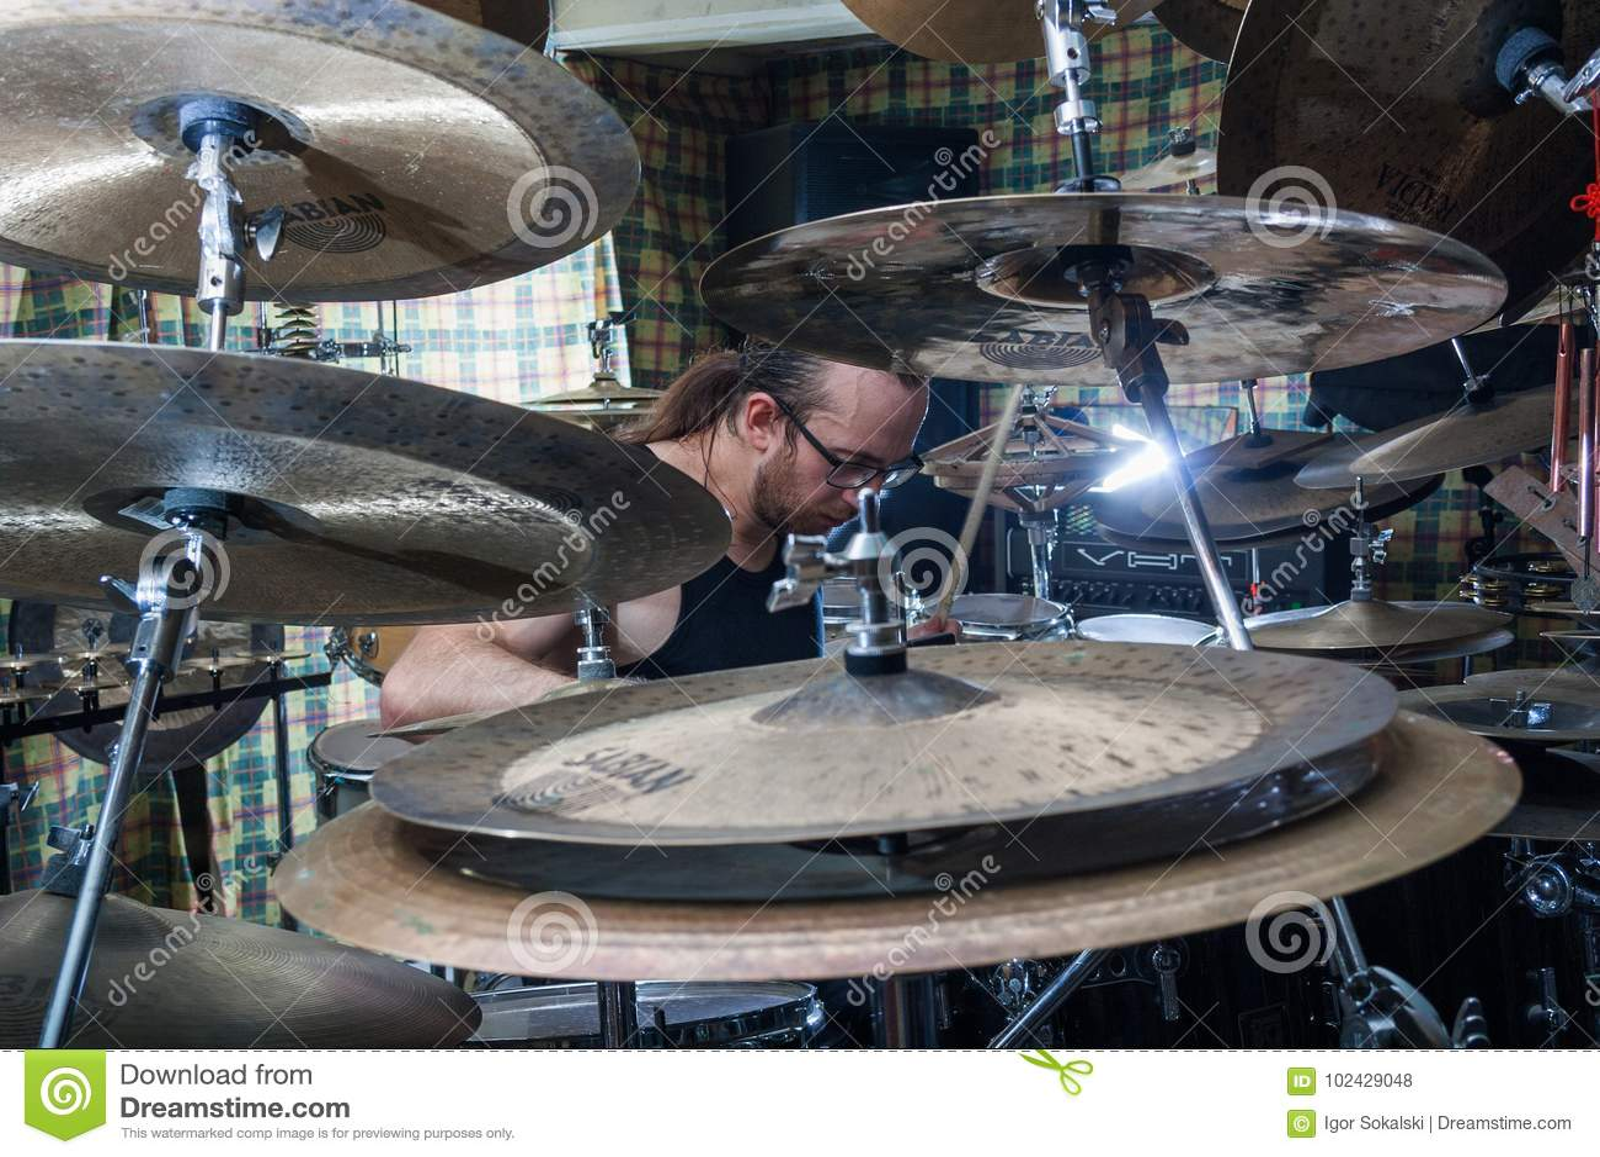 Alexey Bobrovsky melodic drumming